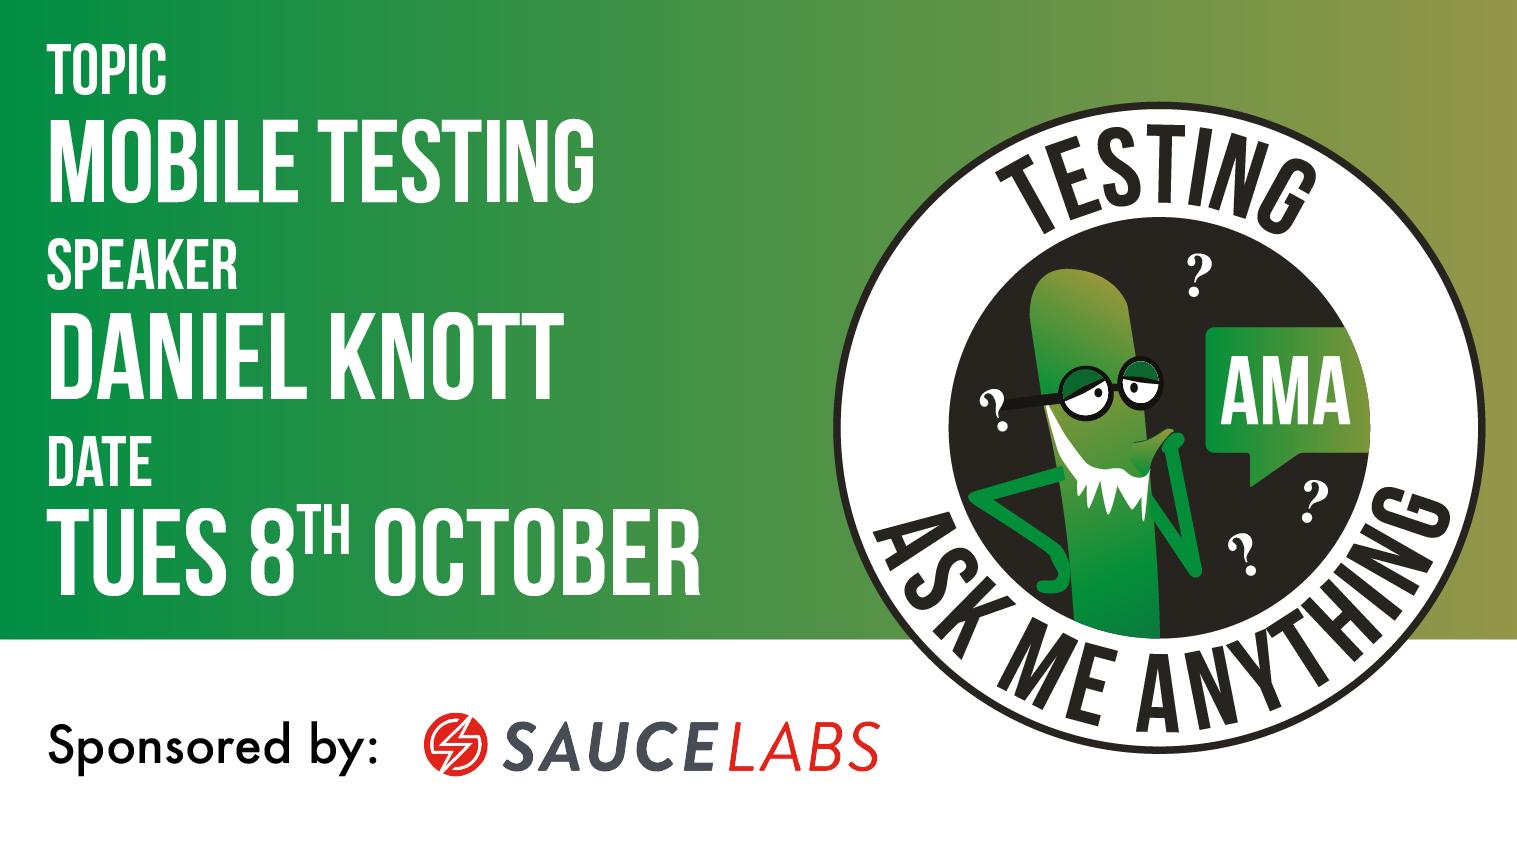 Testing Ask Me Anything - Mobile Testing - Daniel Knott, starts: 2019-10-08